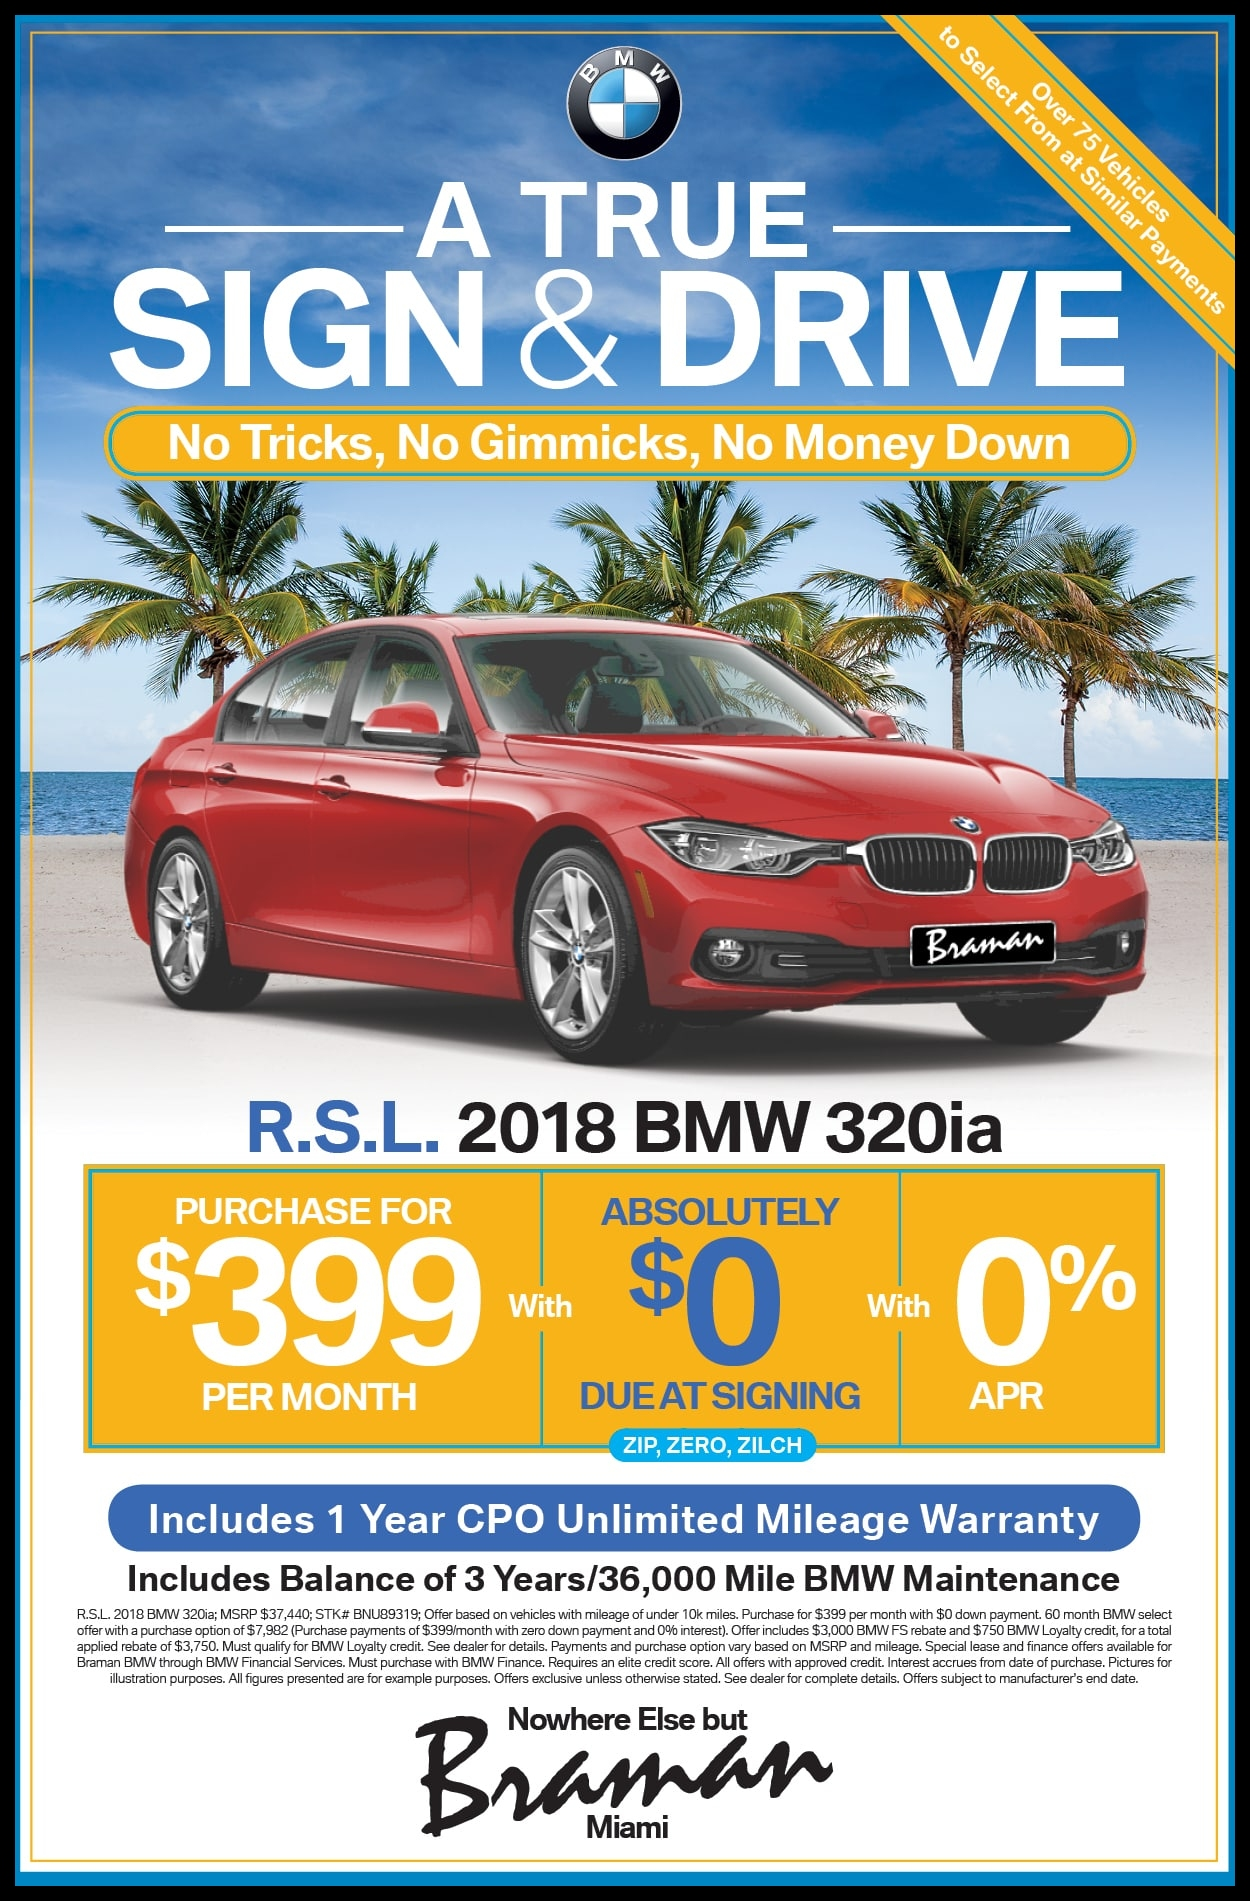 Braman Motors BMW Miami Newspaper and Print Ad Specials